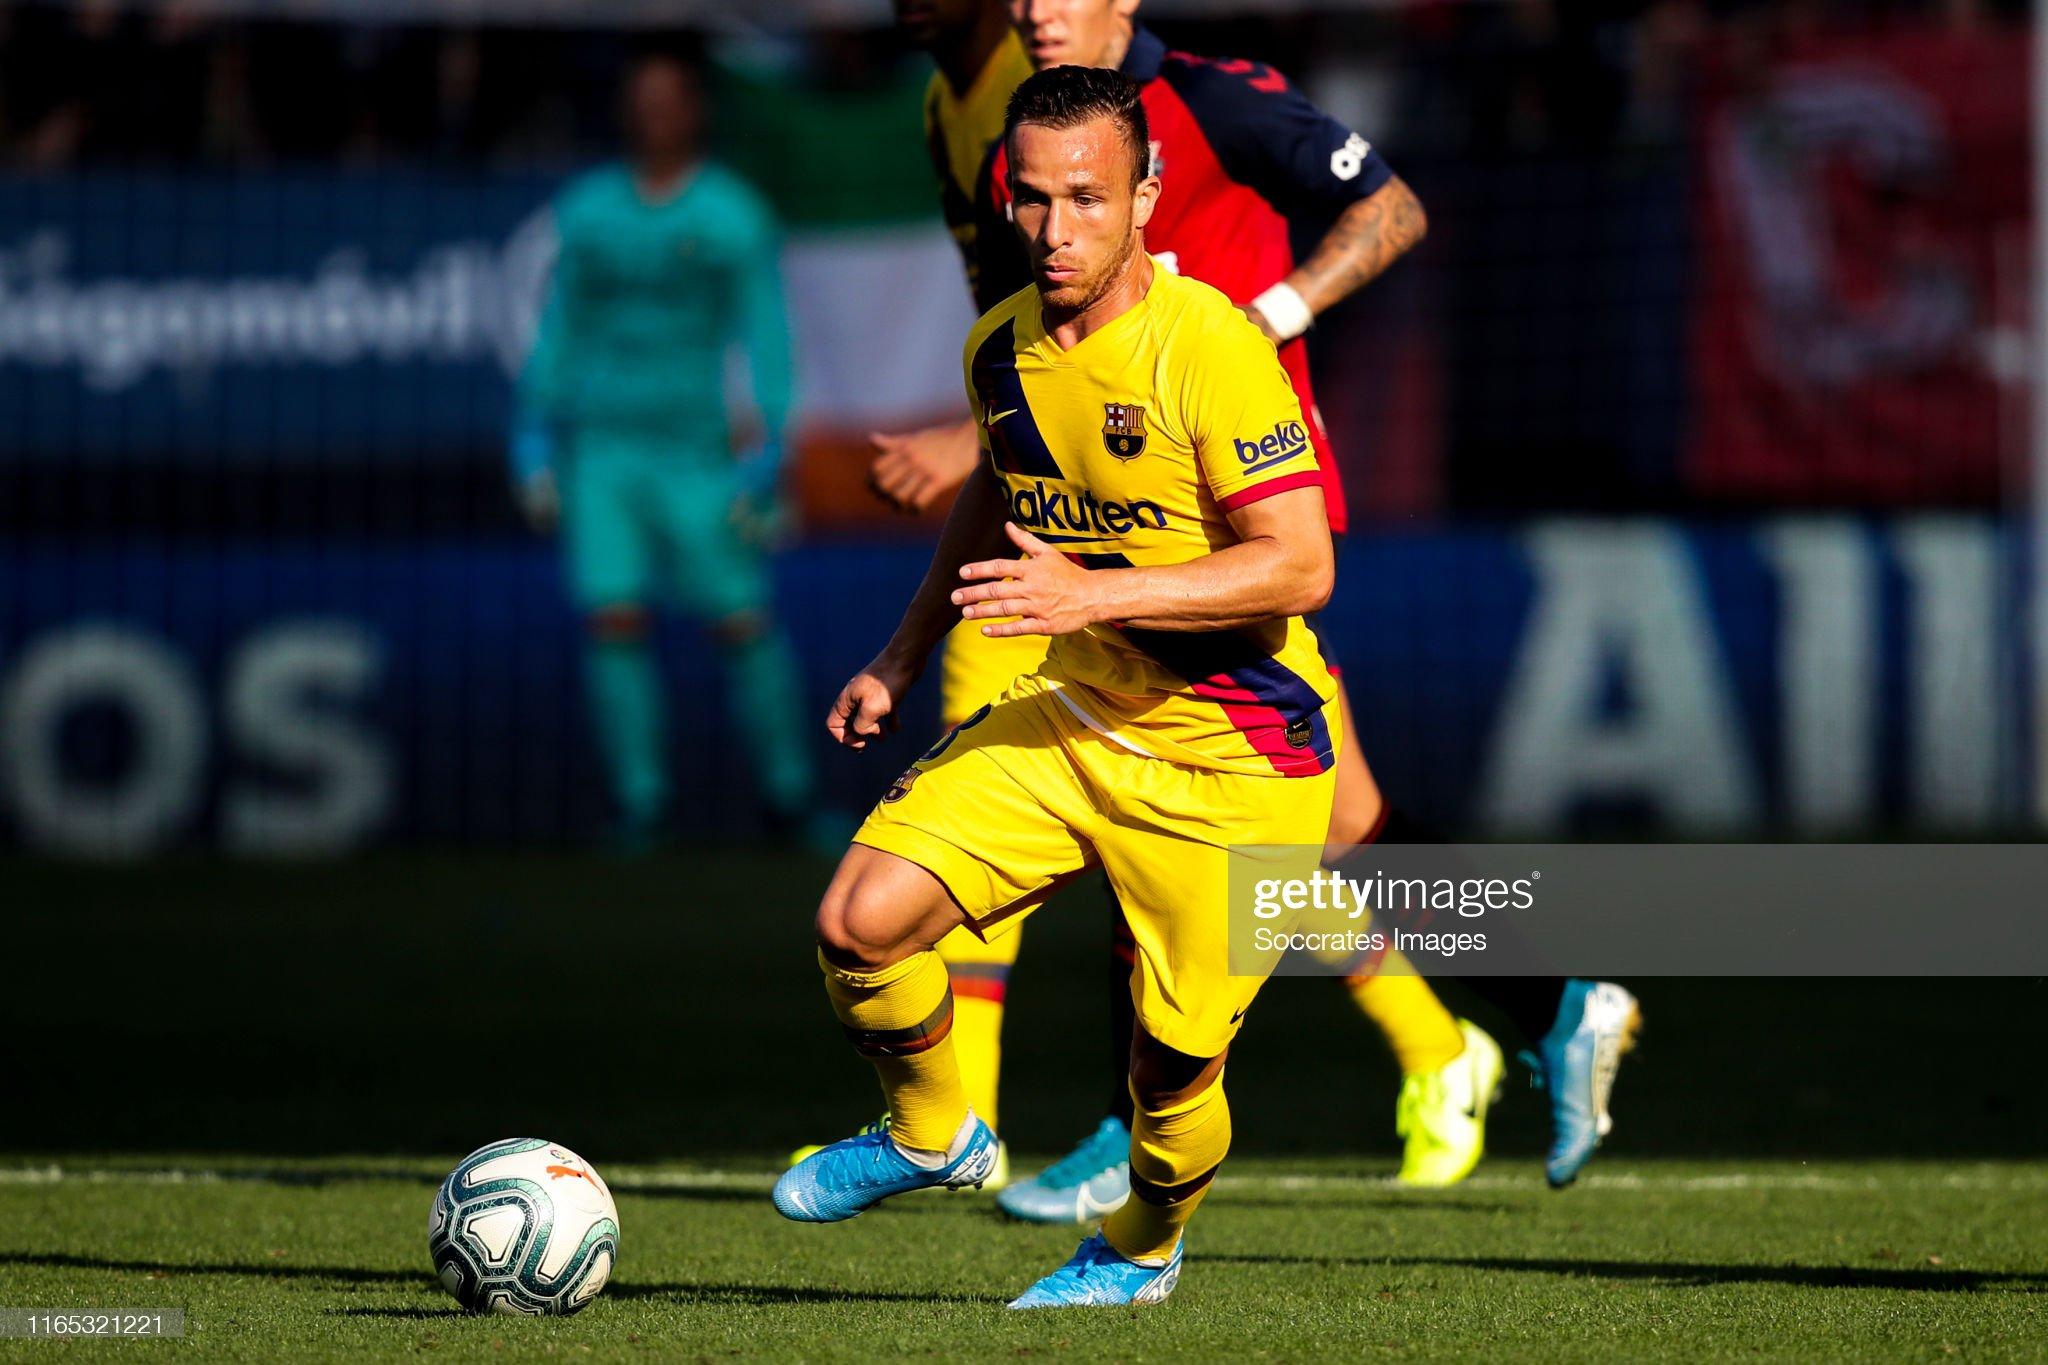 صور مباراة : أوساسونا - برشلونة 2-2 ( 31-08-2019 )  Arthur-of-fc-barcelona-during-the-la-liga-santander-match-between-v-picture-id1165321221?s=2048x2048